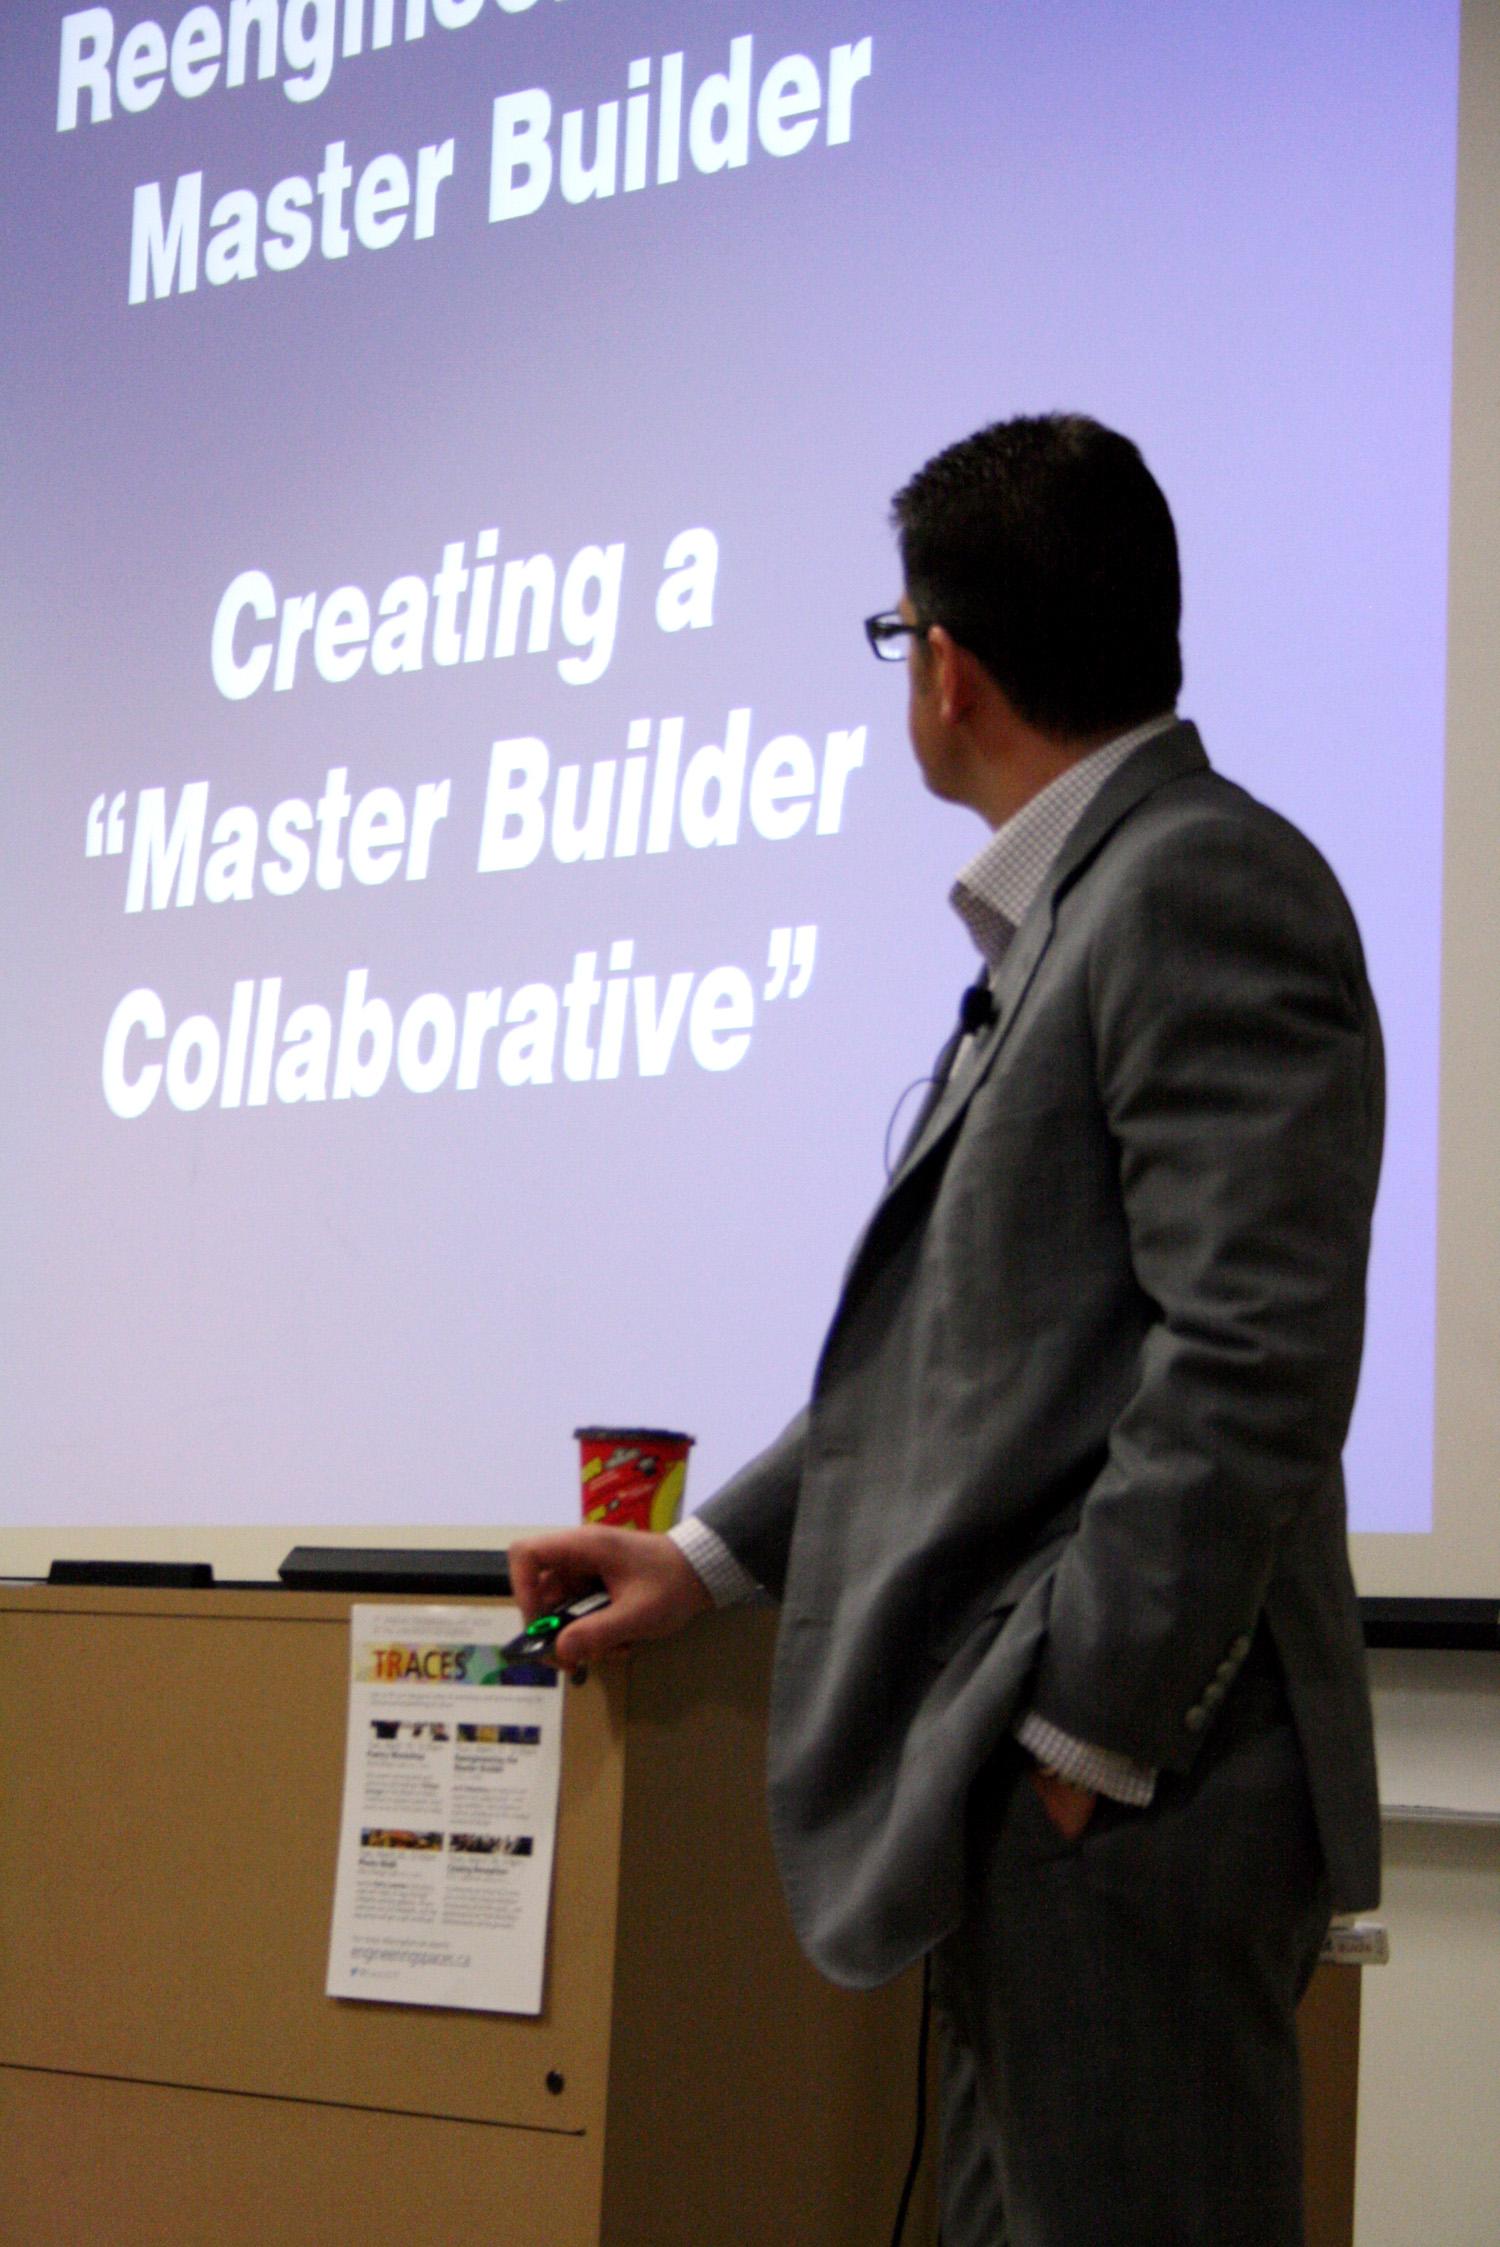 _Reengineering the Master Builder_